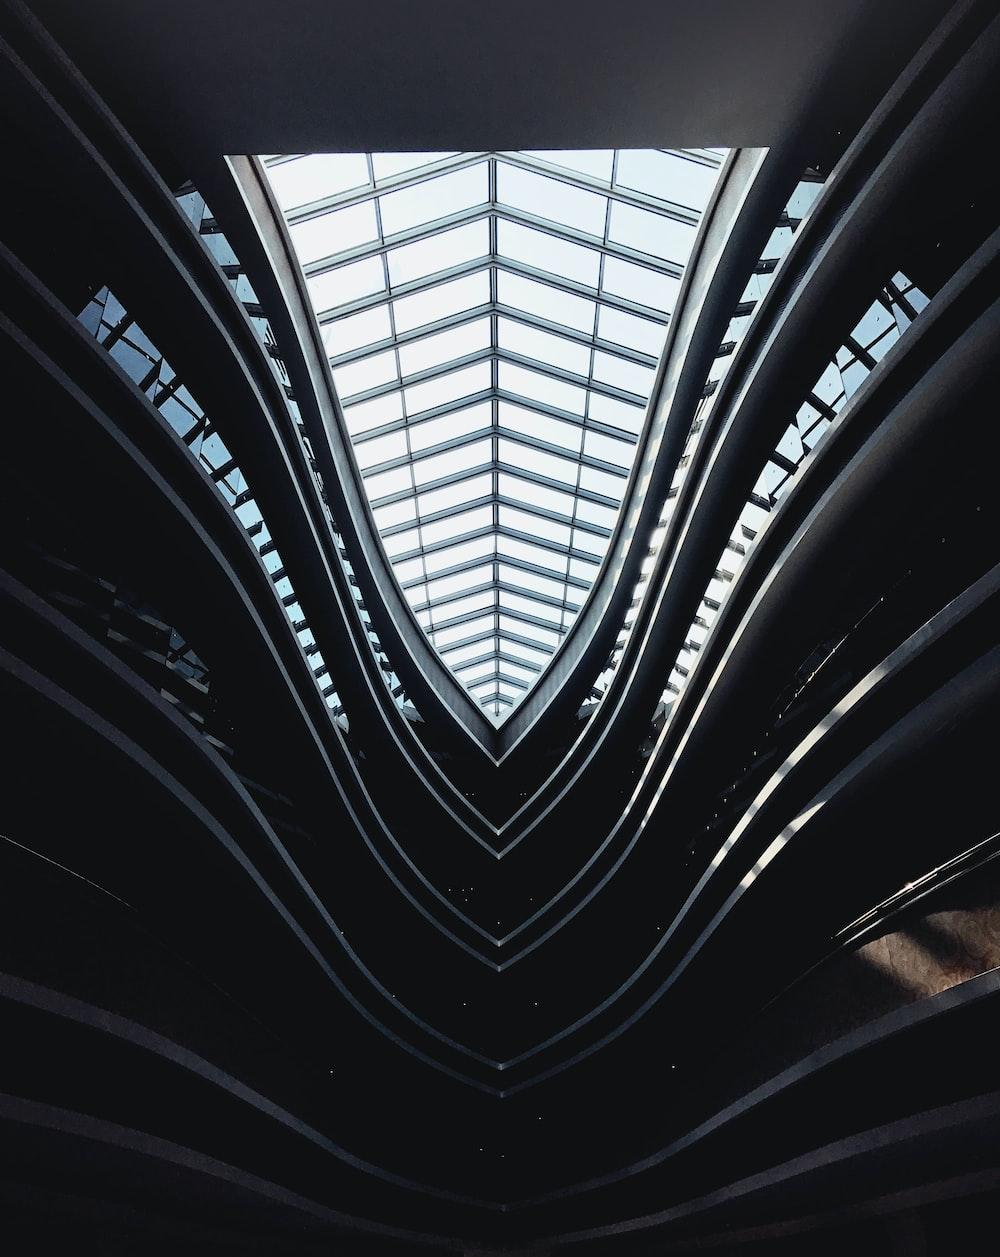 ceiling window design during daytime